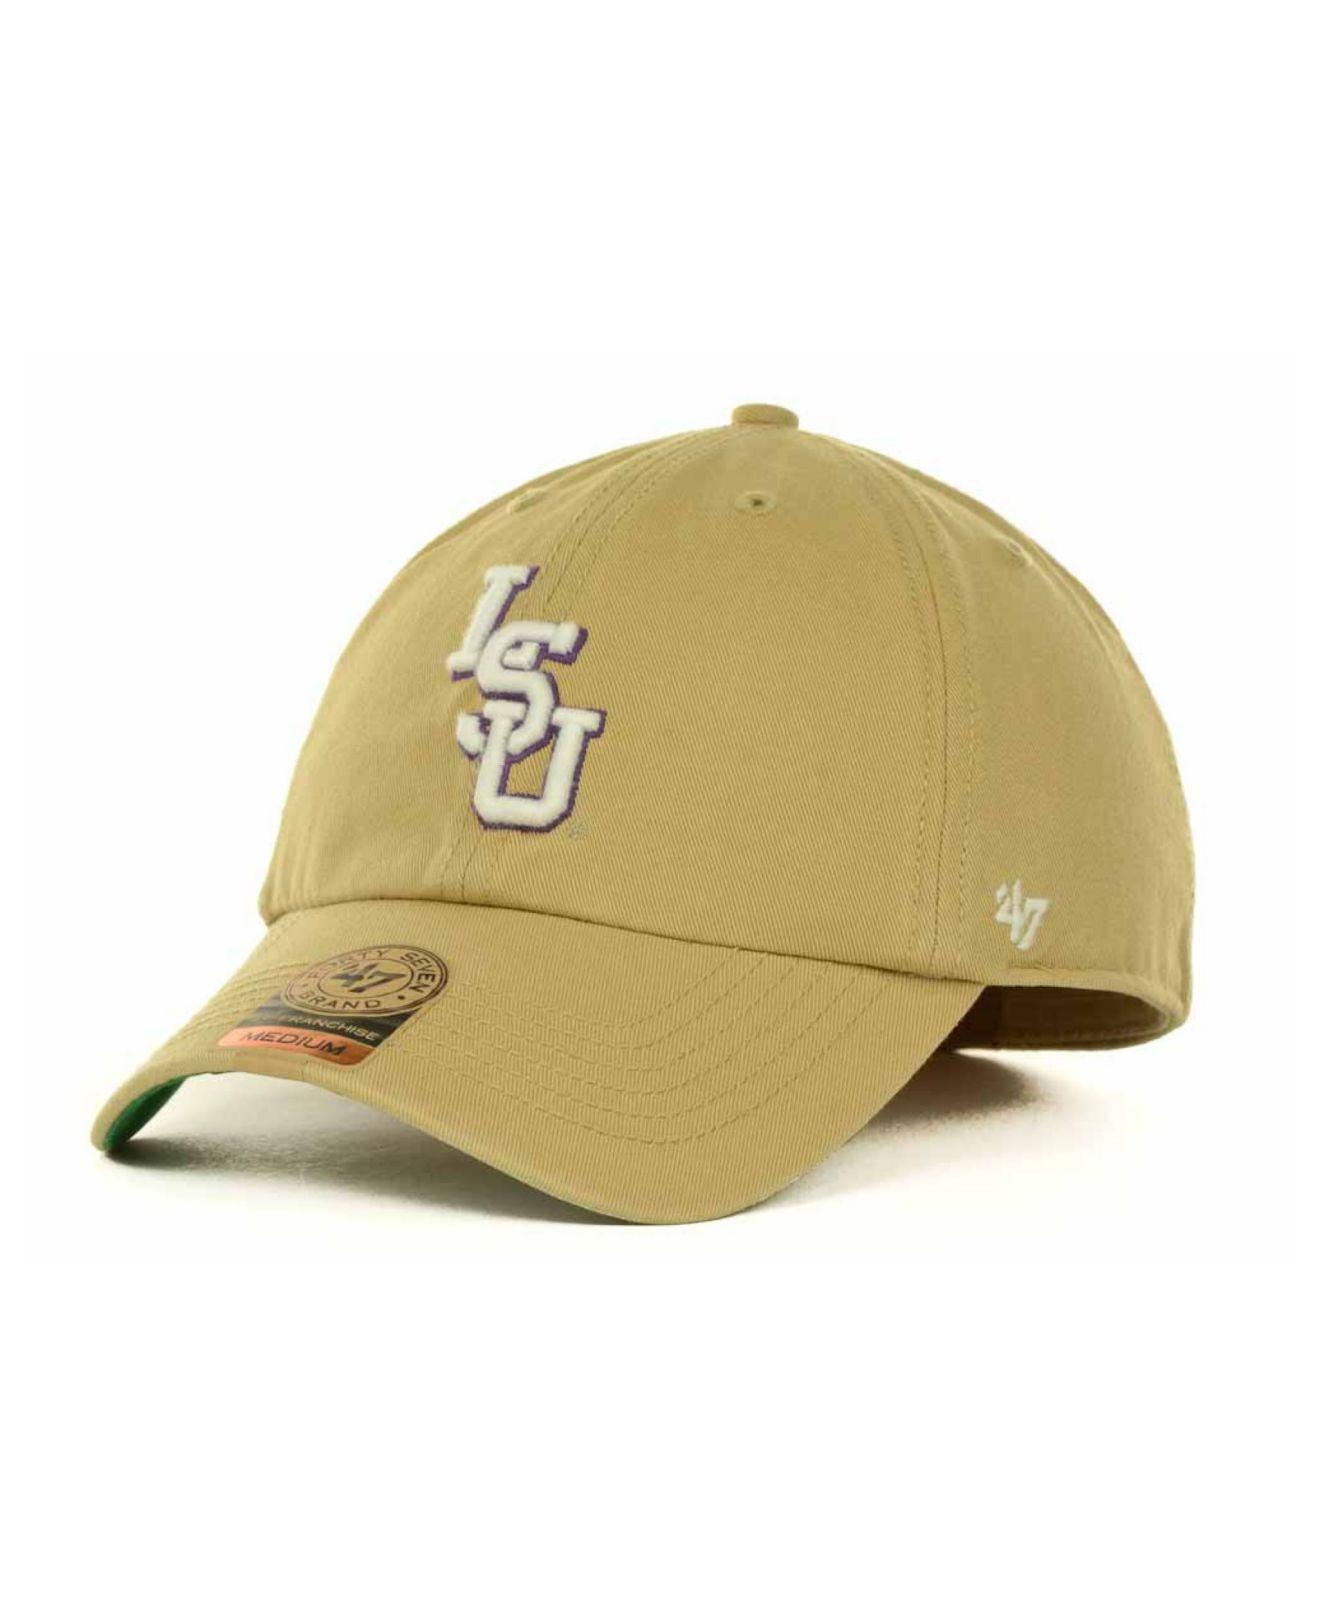 19b7e53d9ad13 clearance lyst 47 brand lsu tigers khaki franchise cap in natural for men  b6c80 2e667